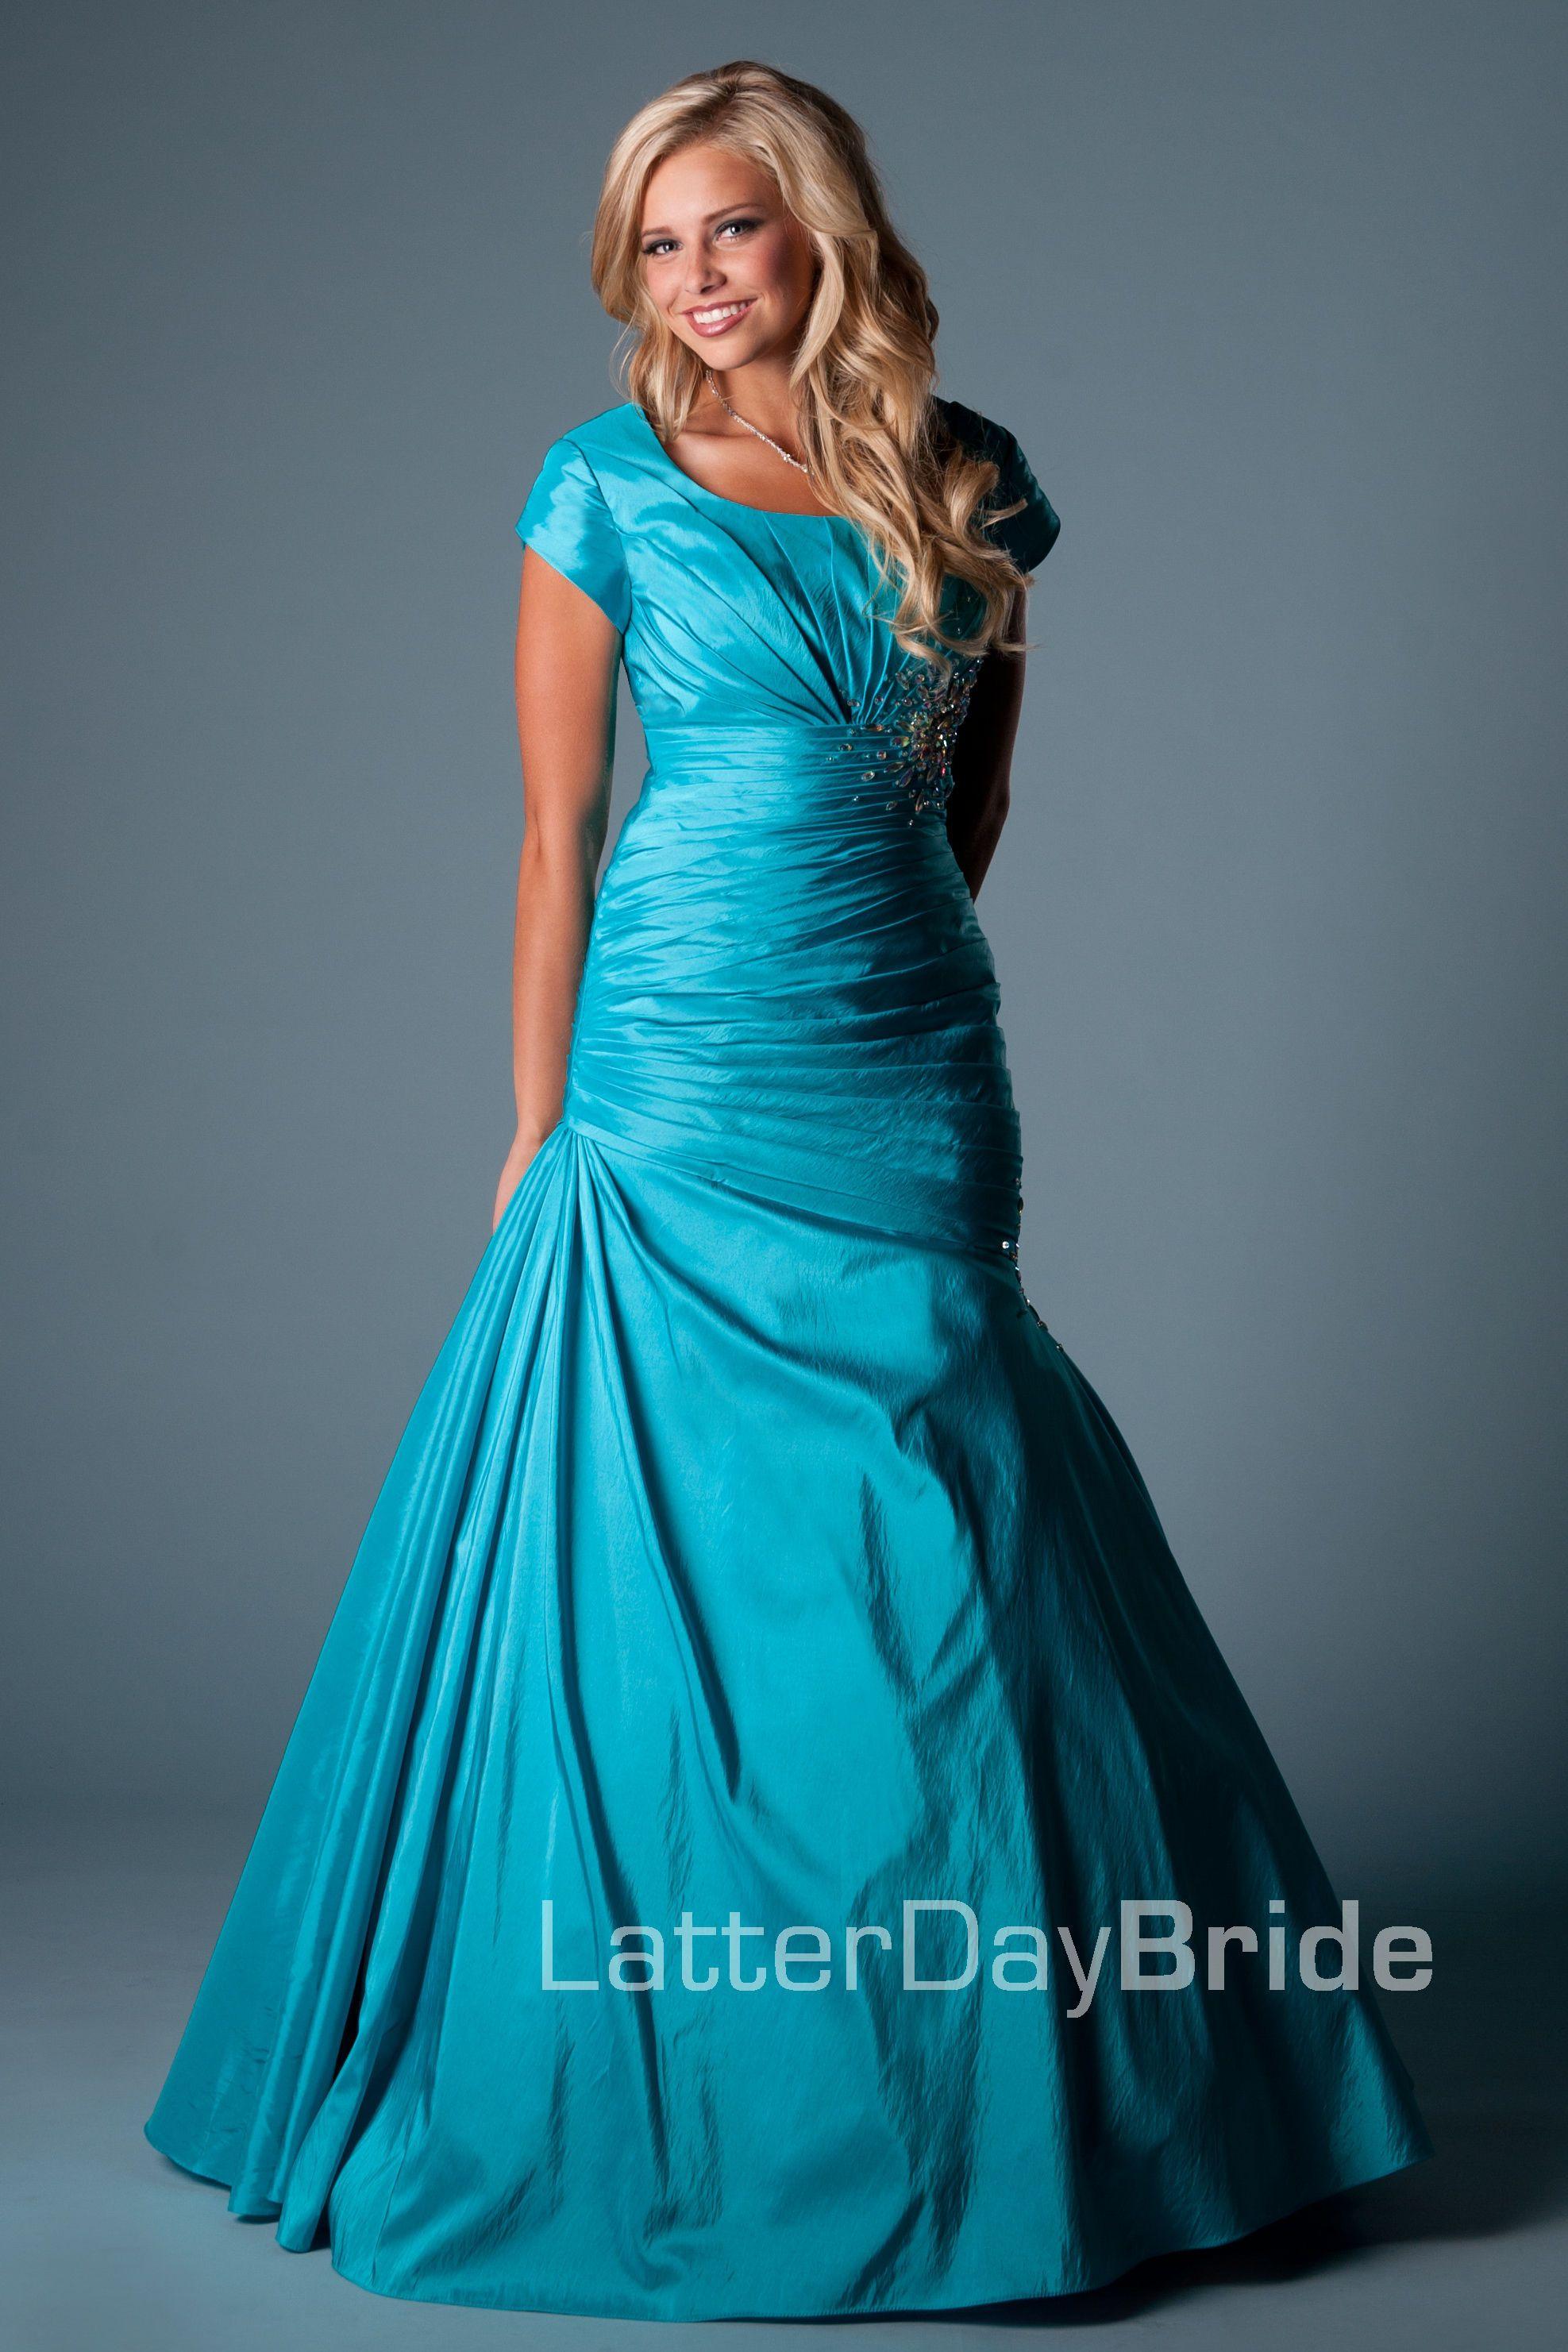 Bridesmaid Prom Trina Latterdaybride Prom Modest Mormon Lds Prom Dress Prom Dresses Prom Dresses Modest Dresses [ 2962 x 1975 Pixel ]